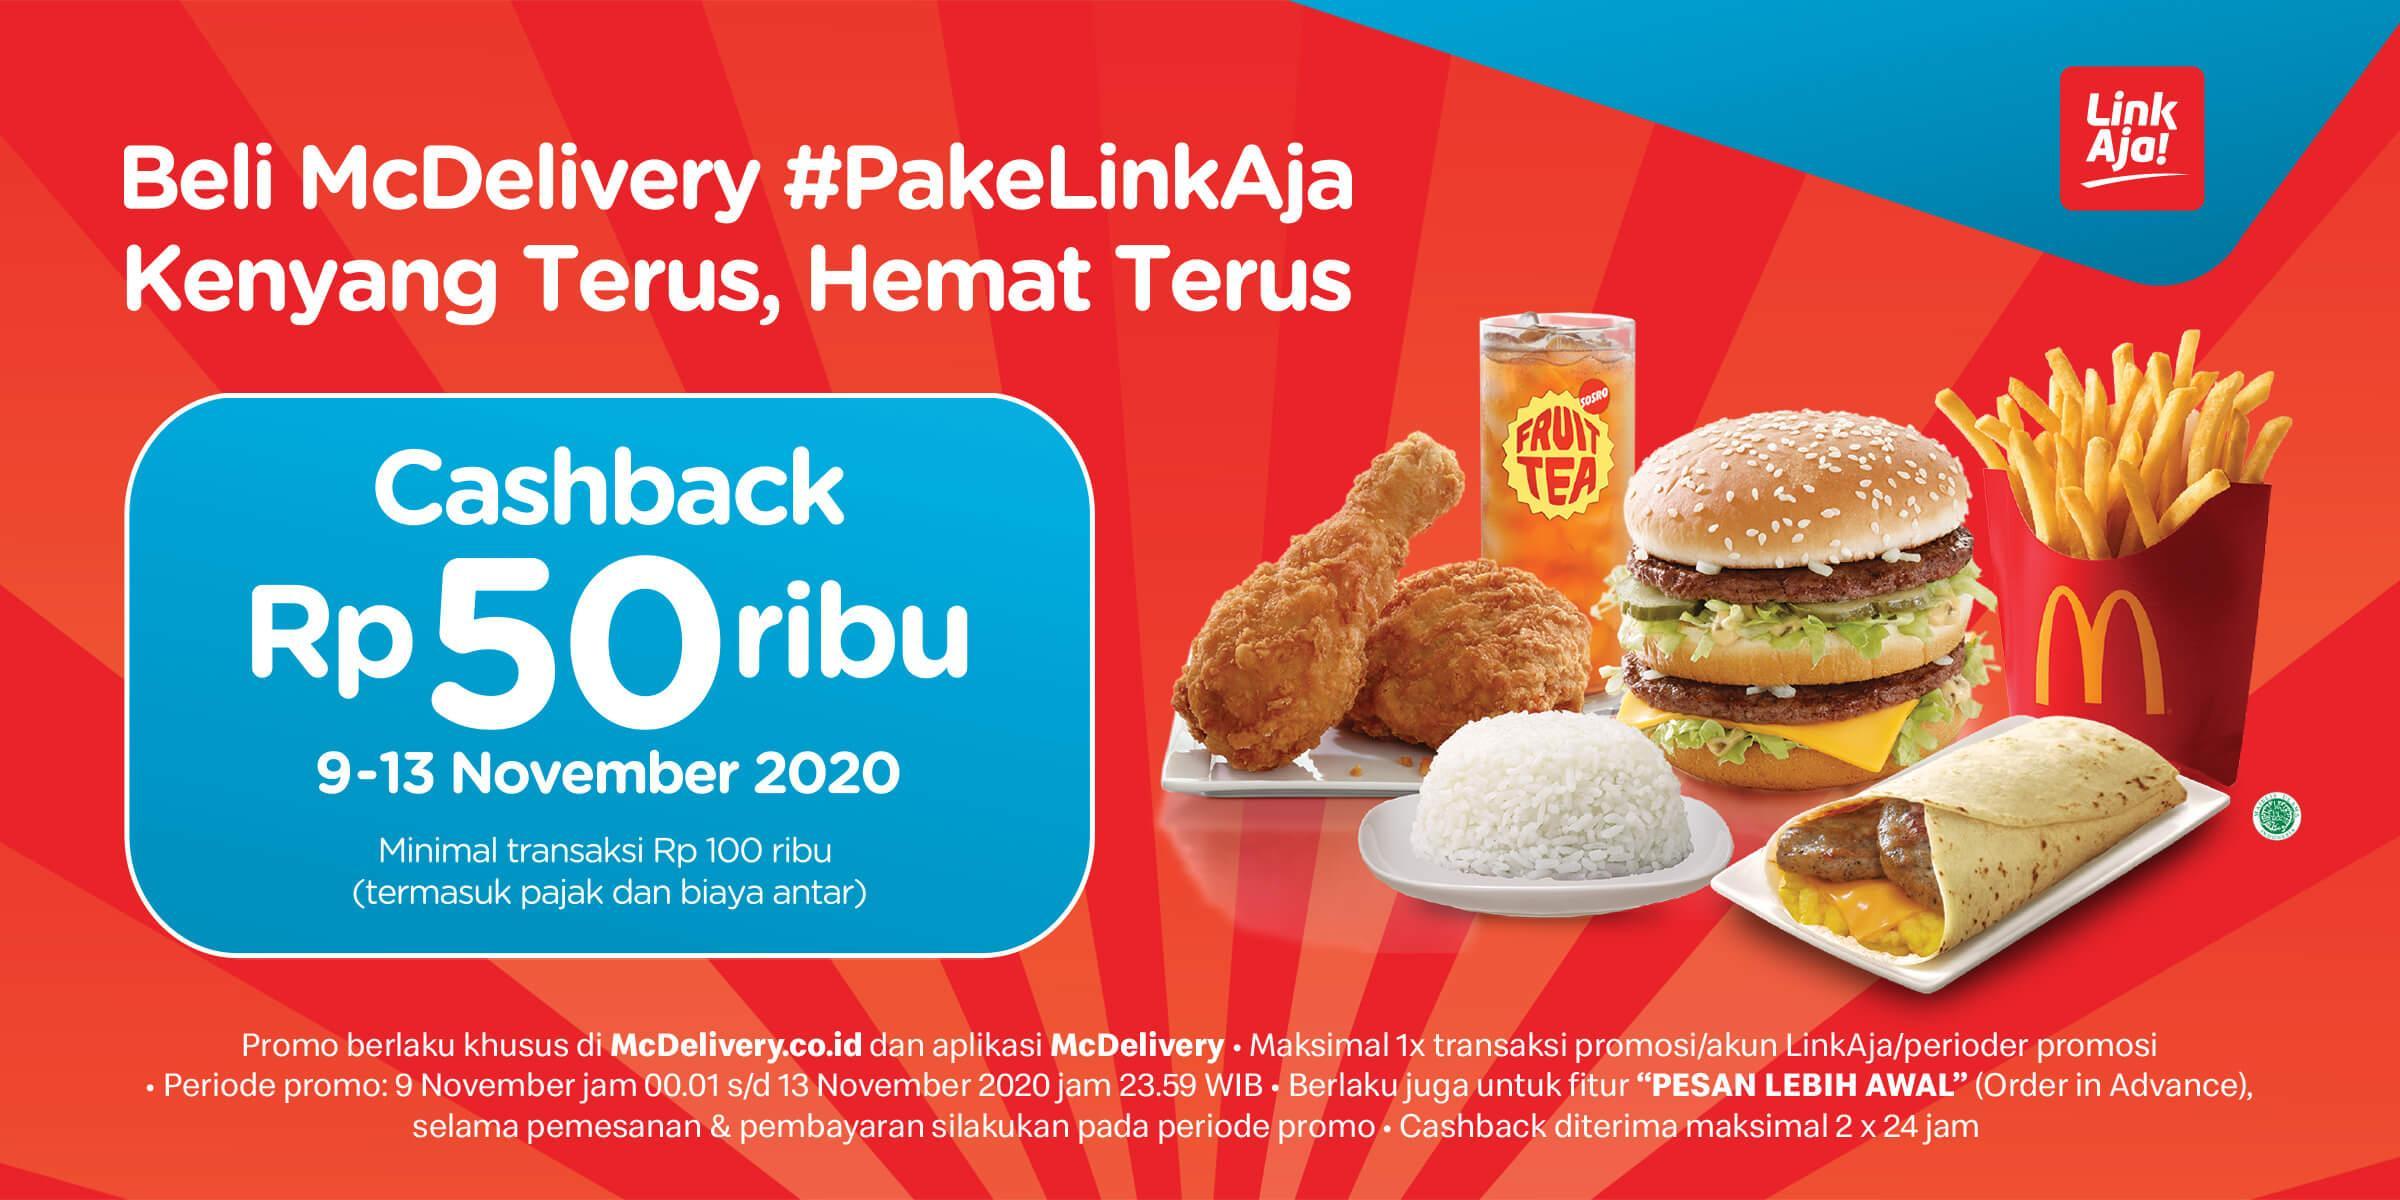 Mcdonald S Indonesia Promo Cashback Rp 50 000 Dengan Linkaja